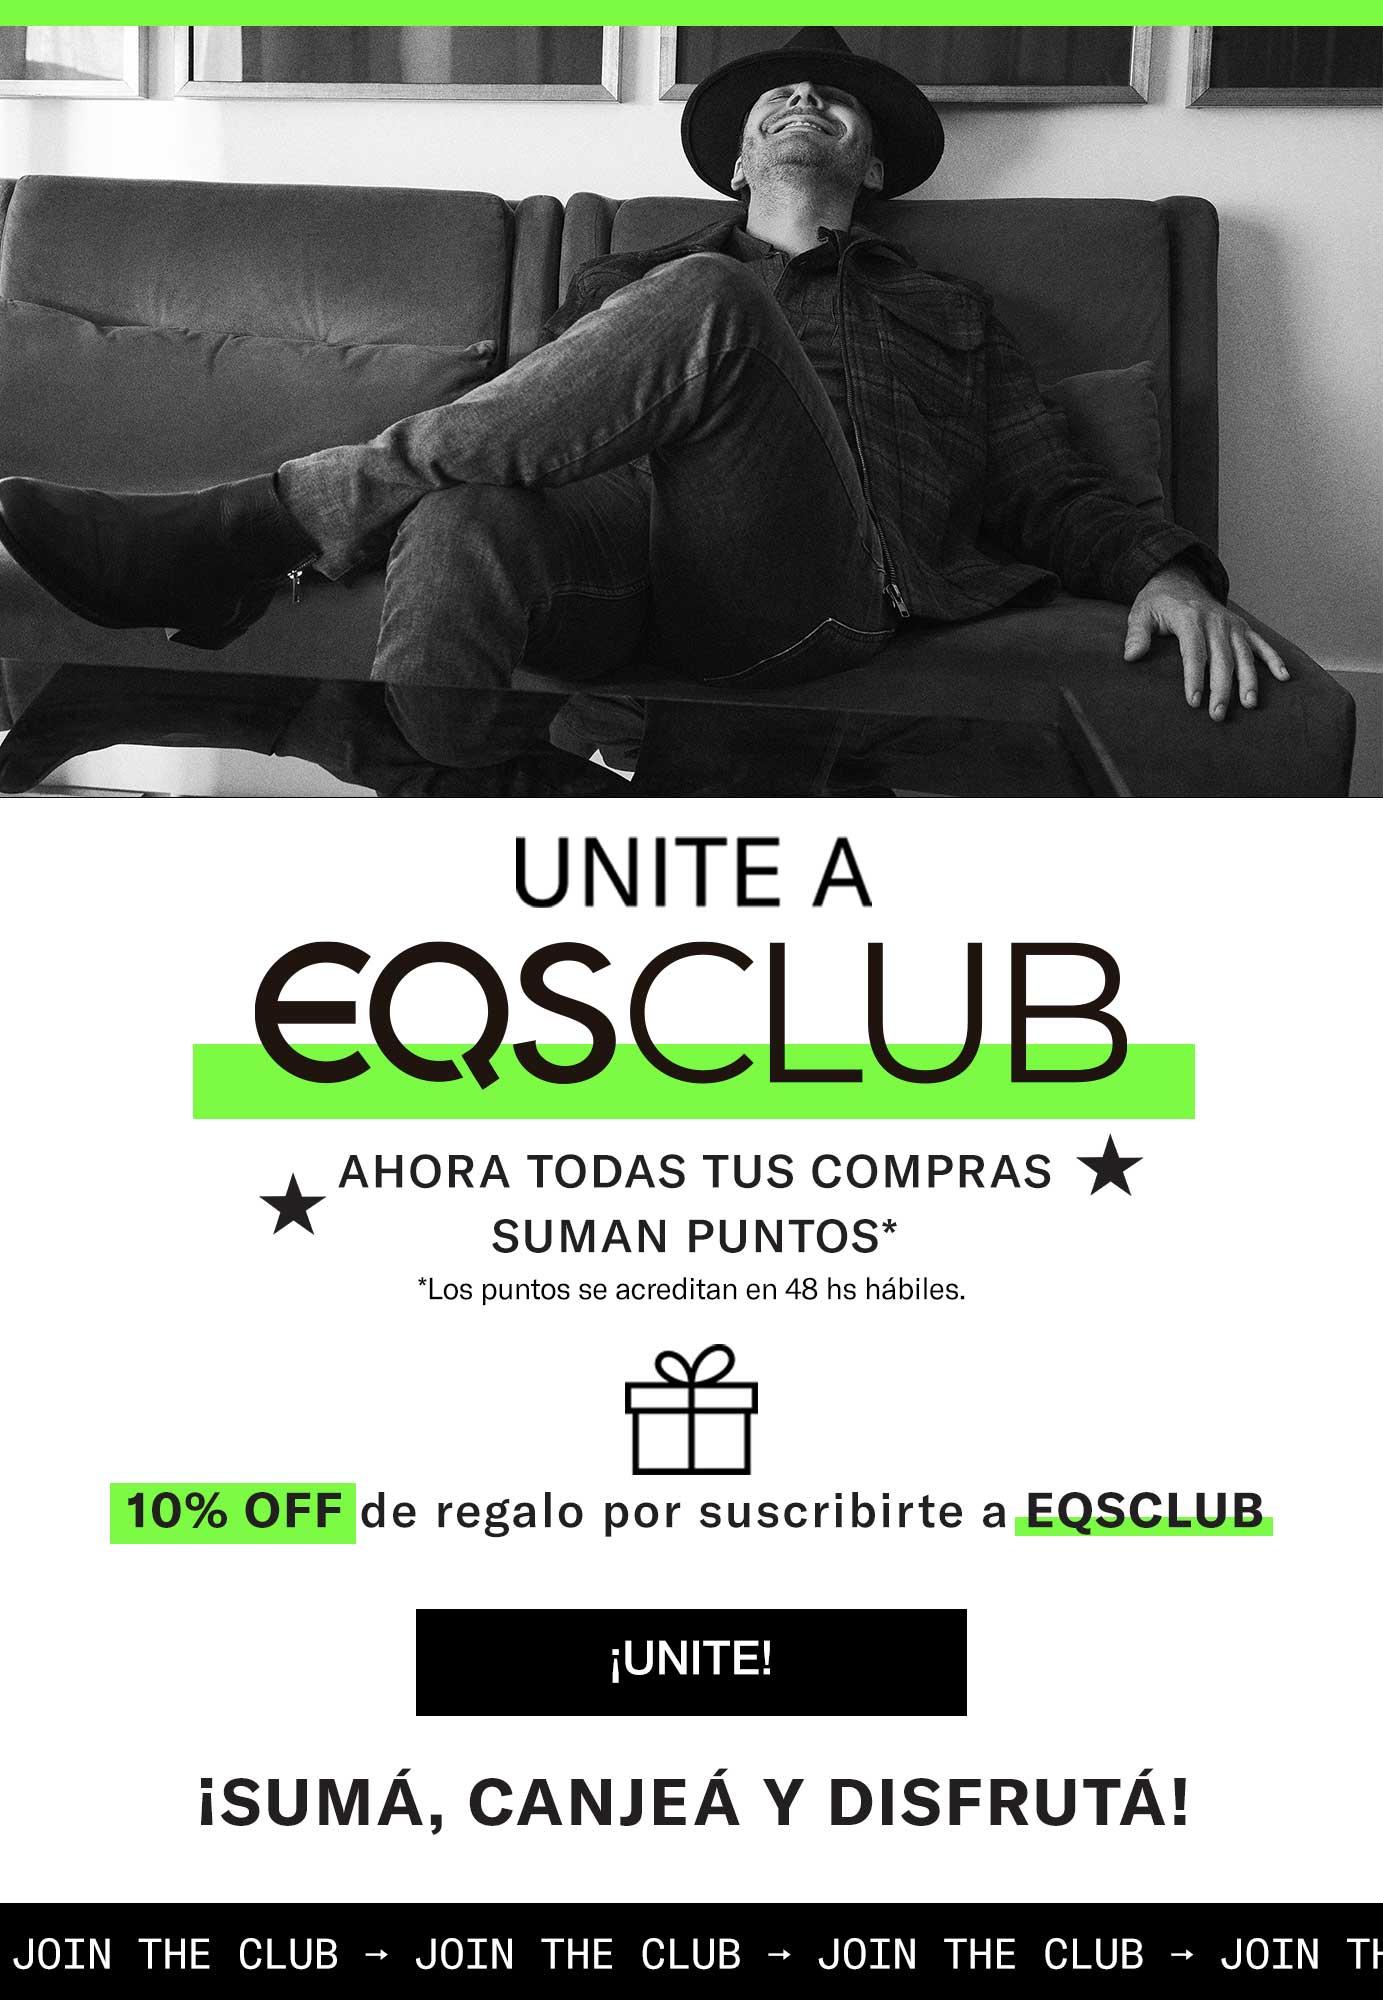 EQS CLUB